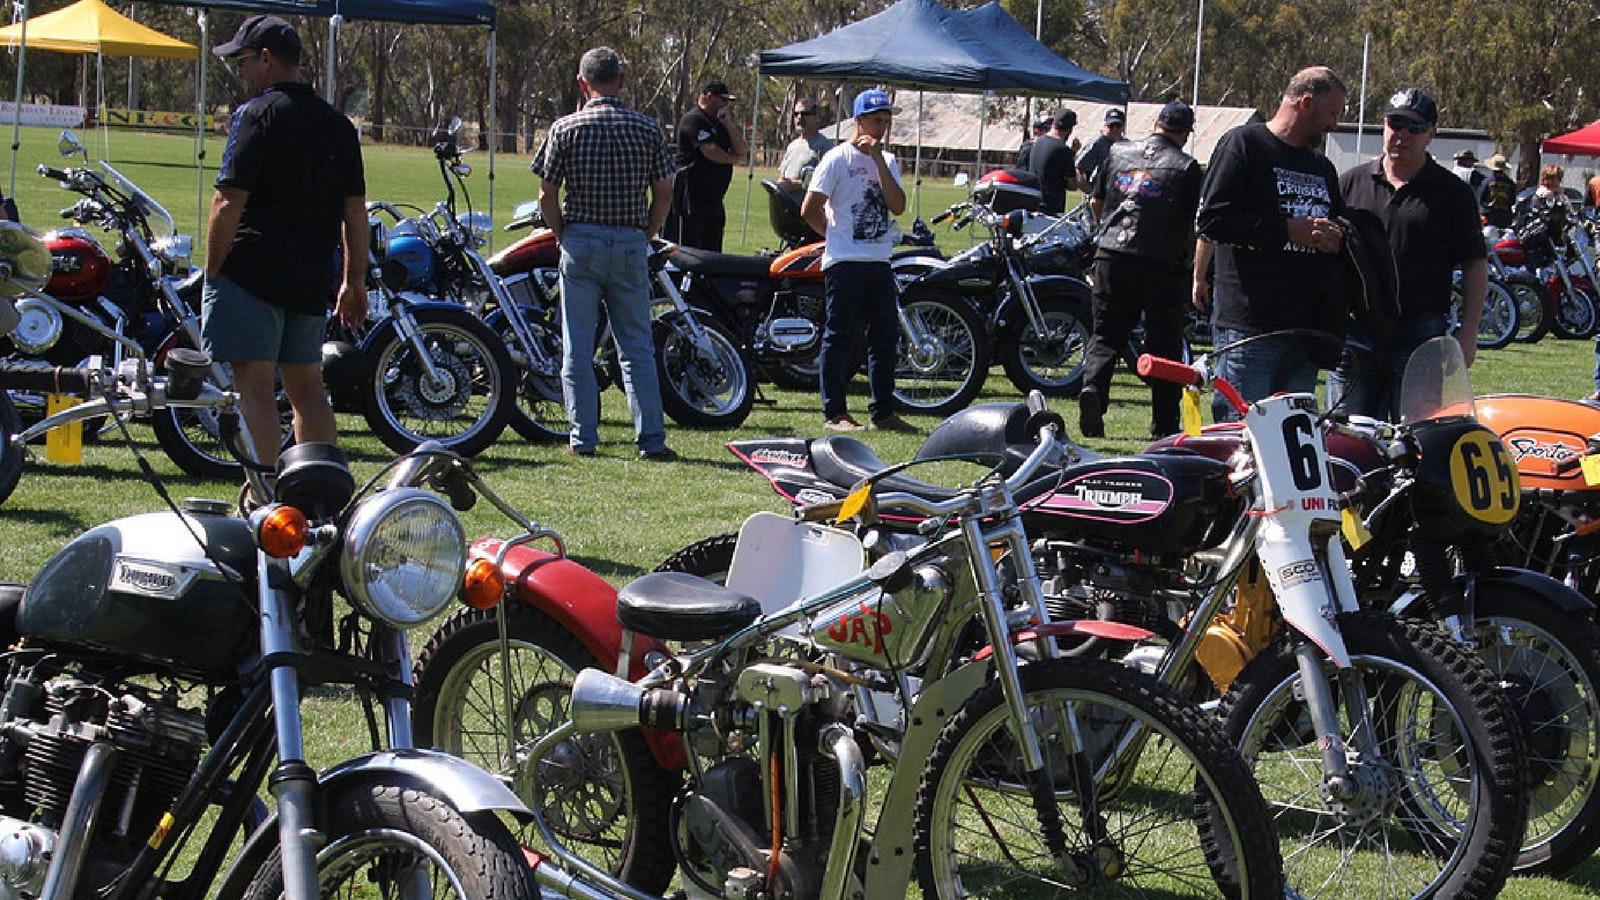 Nathalia Fire Brigade Motorcycle Show